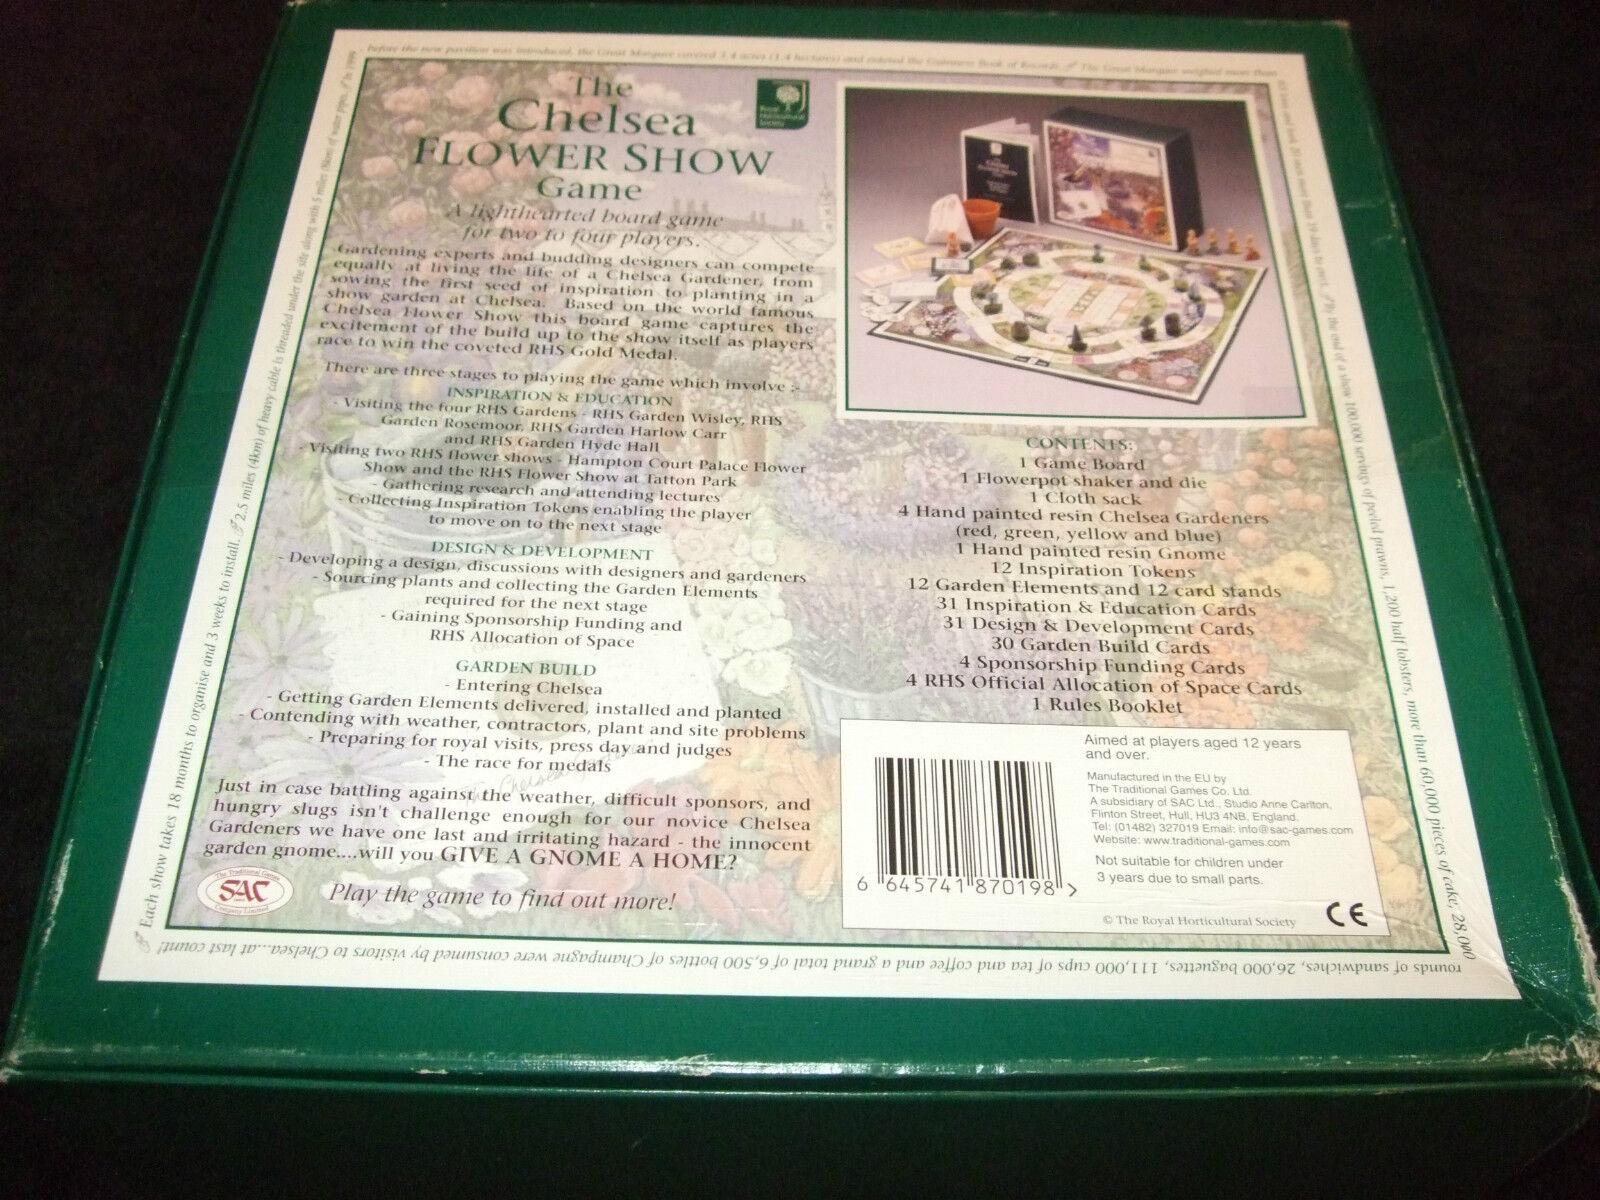 Case Blue Board Game : The family chelsea flower show board game family the board game